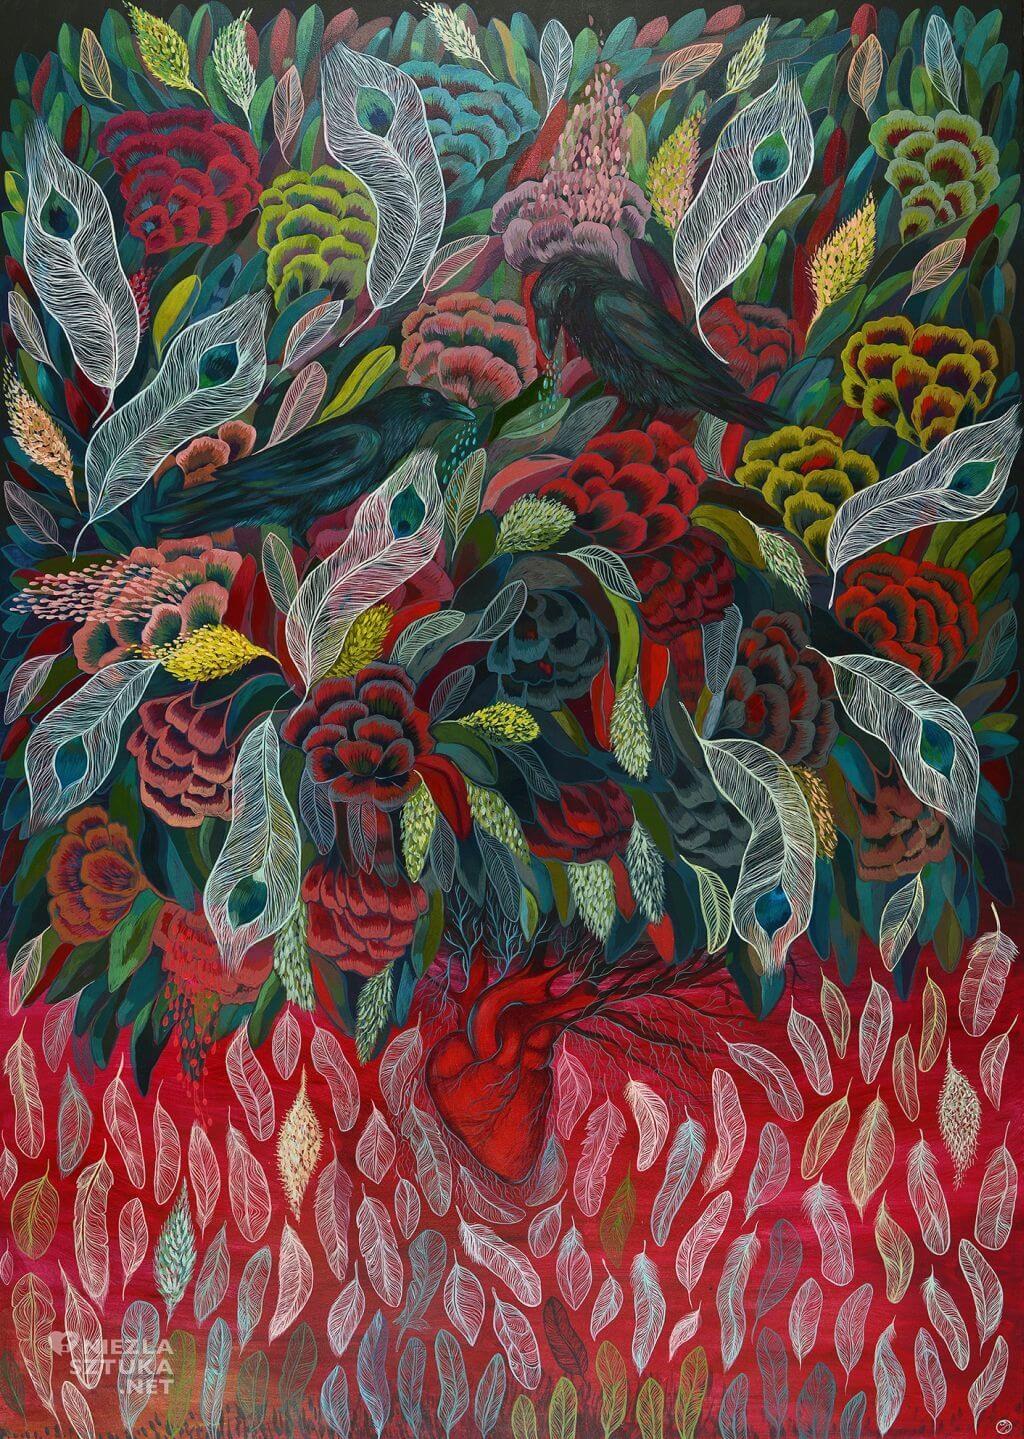 Justyna Stoszek, forest forever, grafika, malarstwo, sztuka polska, młoda sztuka, Niezła sztuka